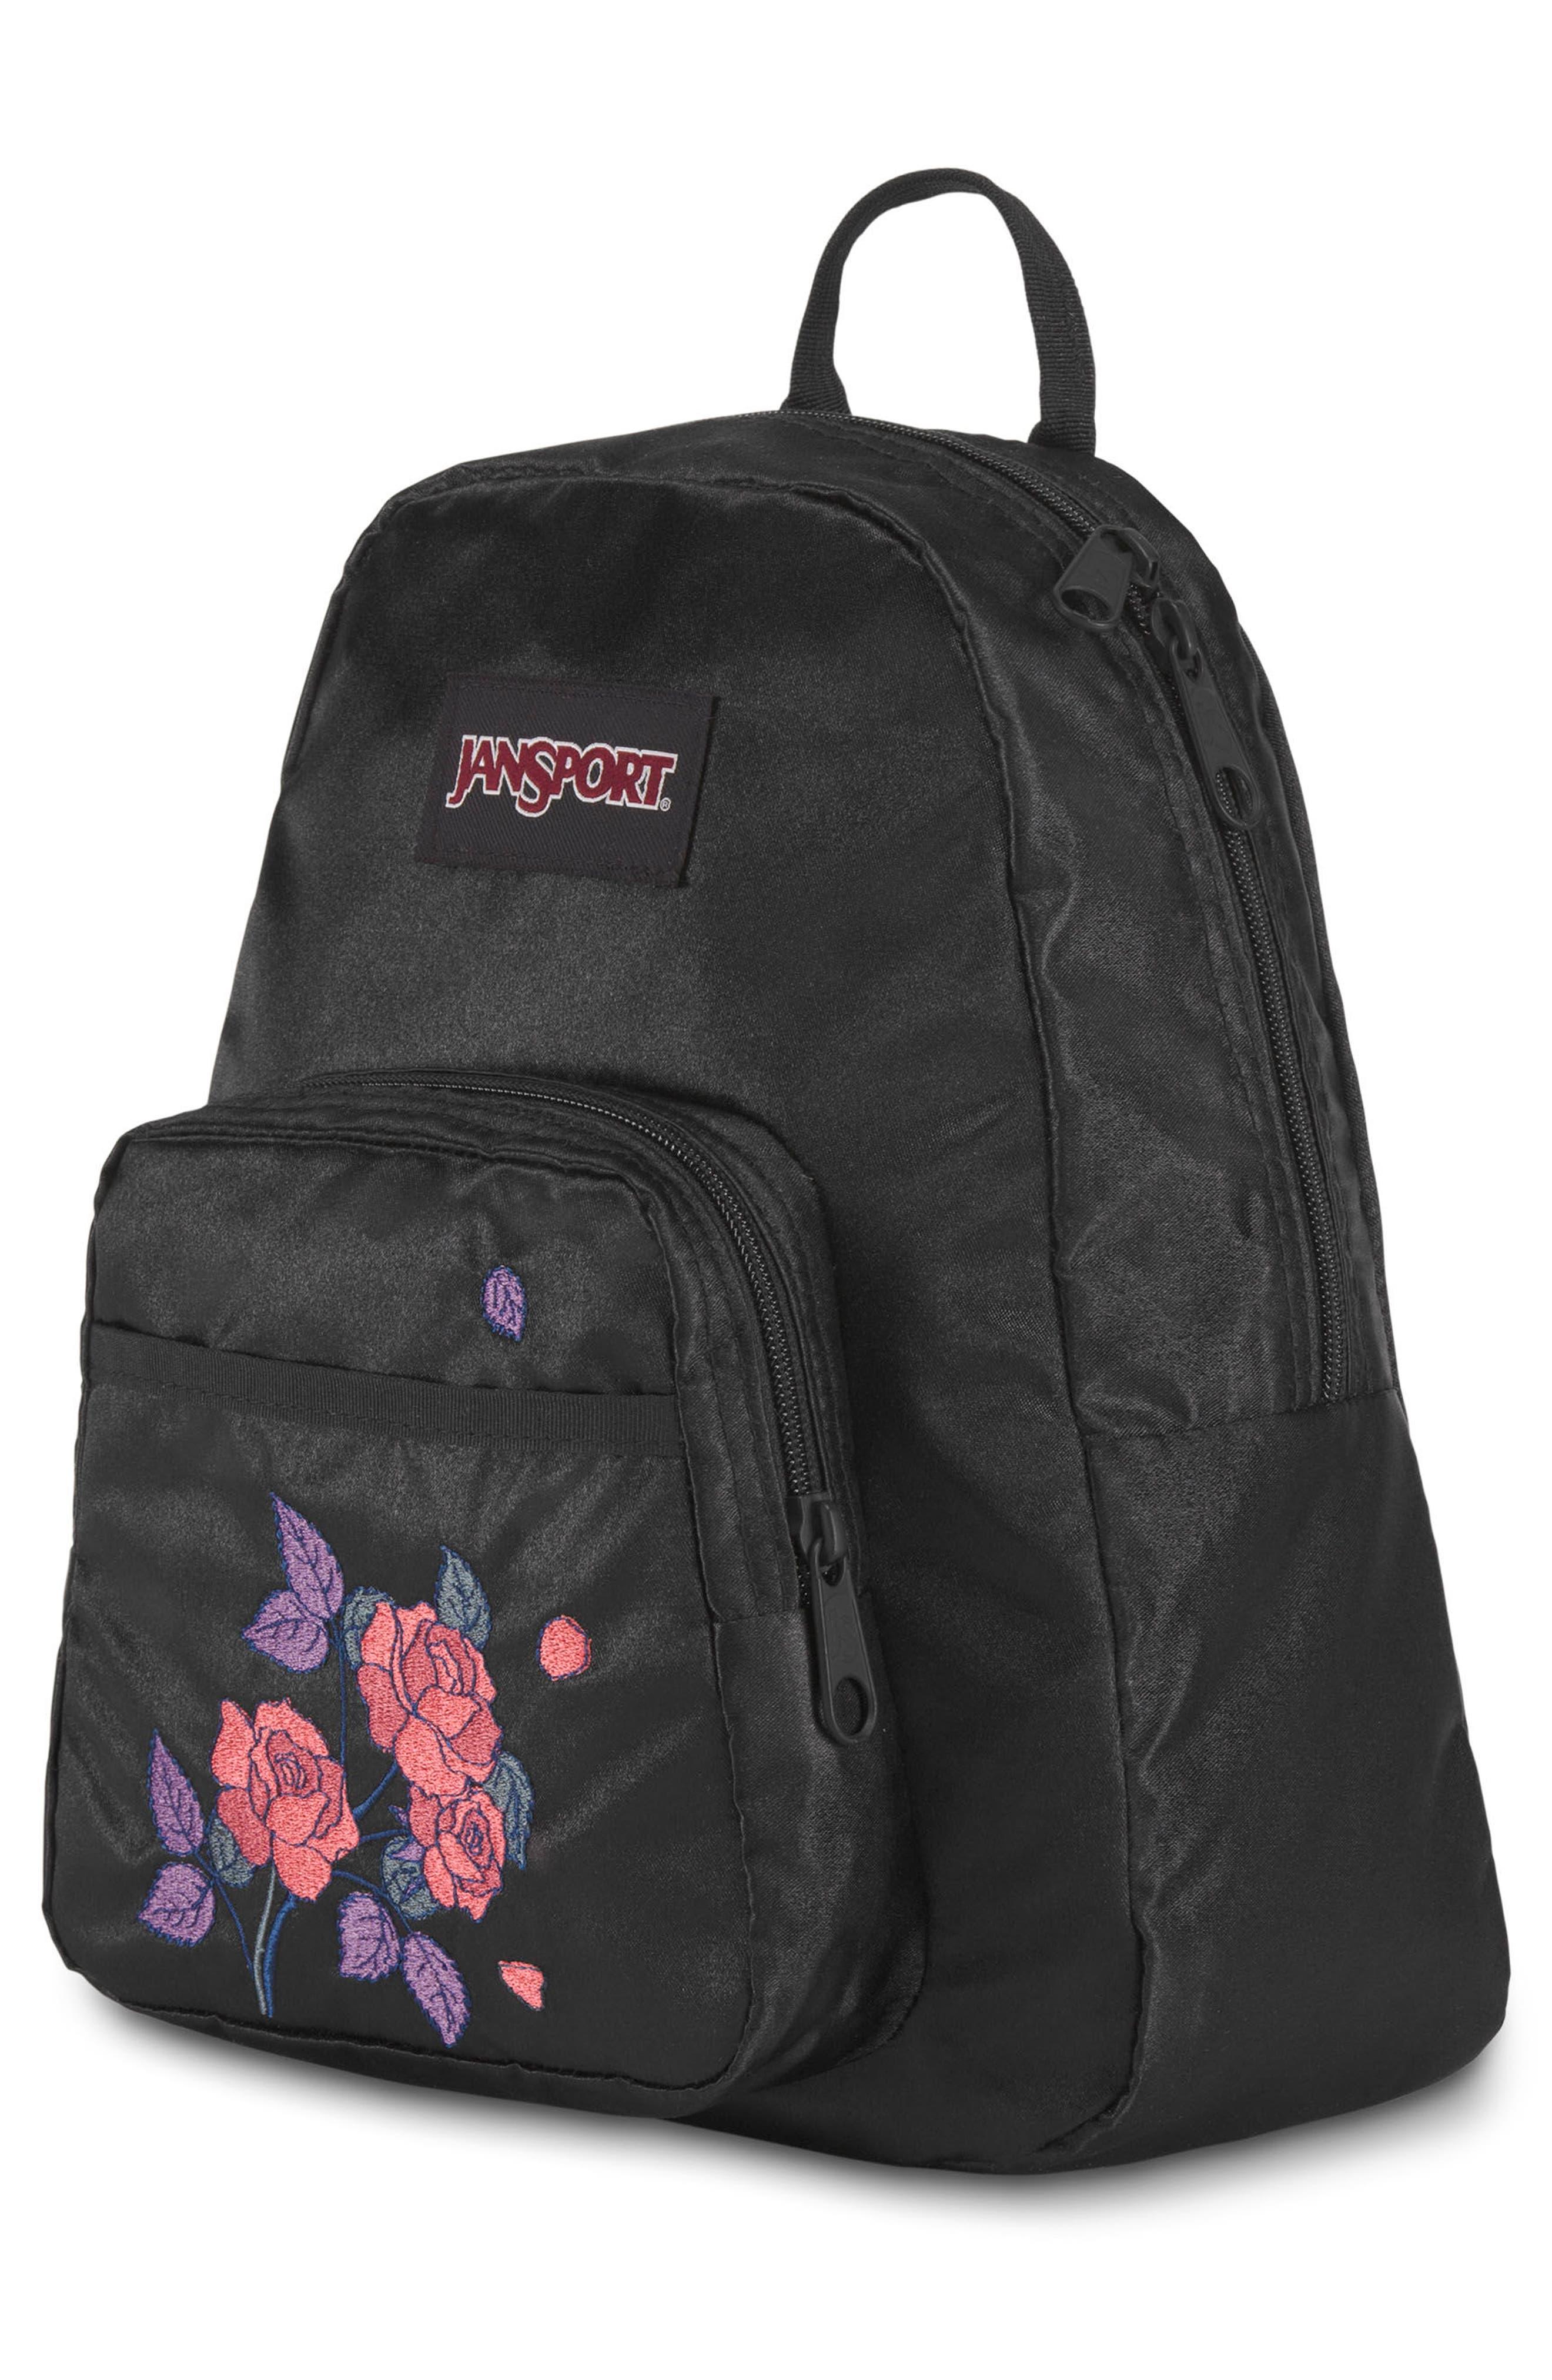 Half Pint FX Backpack,                             Alternate thumbnail 3, color,                             SATIN ROSE